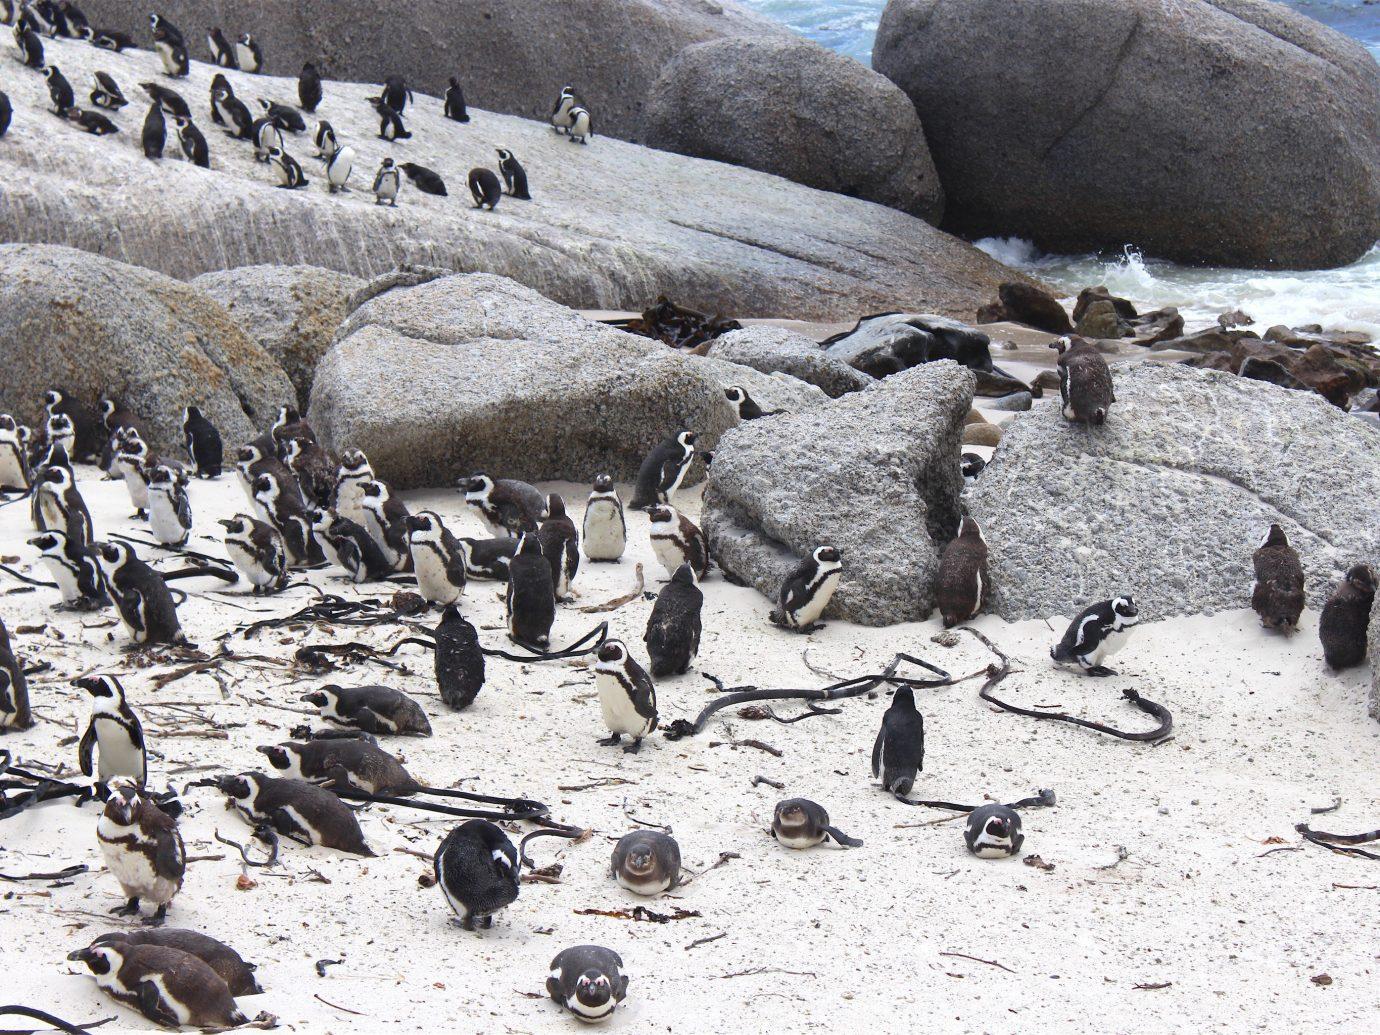 Outdoors + Adventure Safaris Trip Ideas ground outdoor rock flightless bird Bird penguin vertebrate fauna rocky Wildlife flock